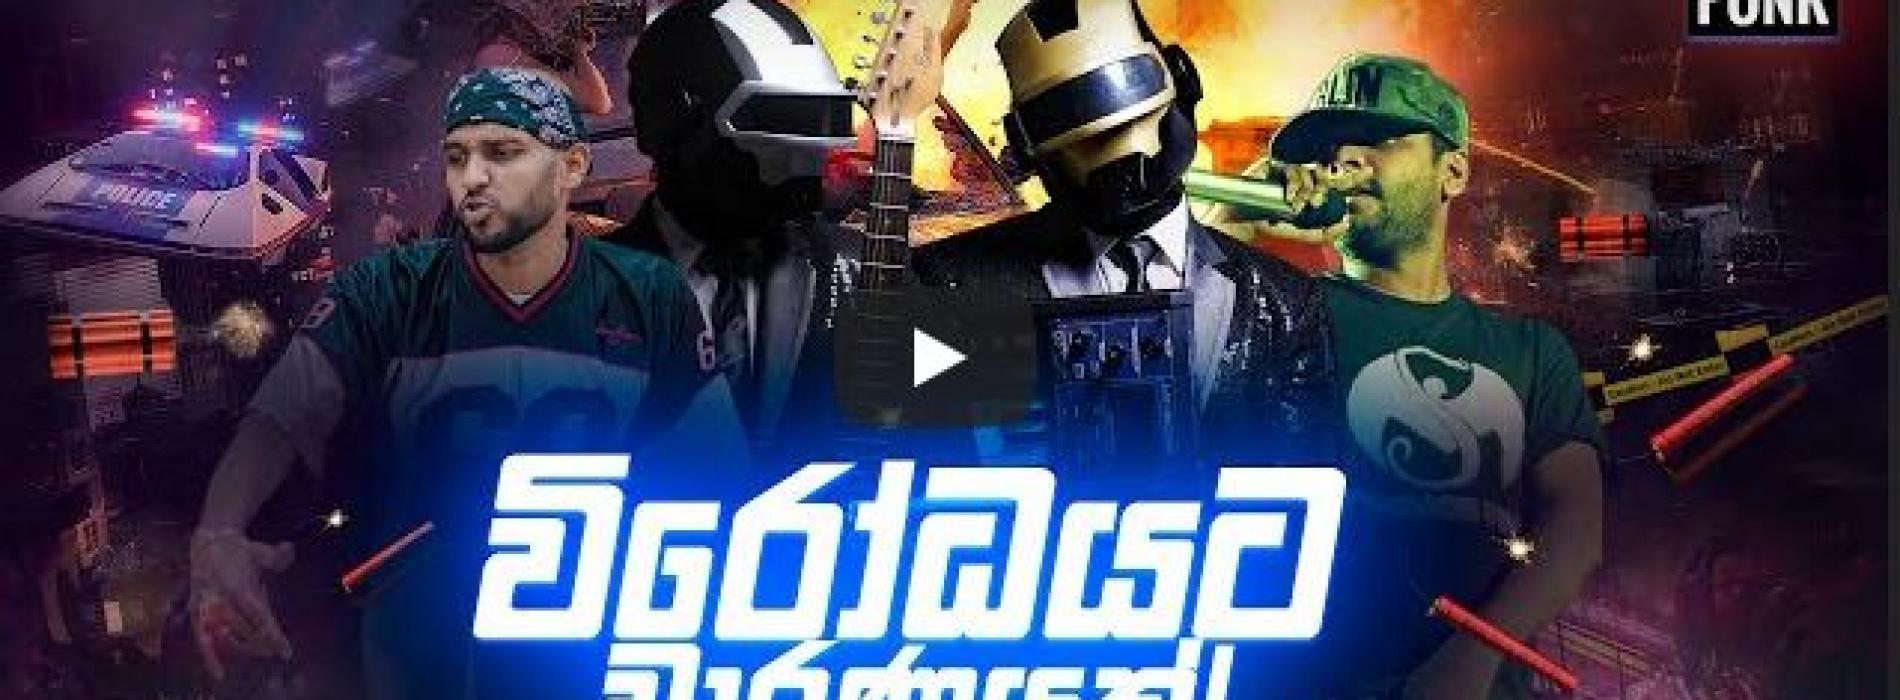 New Music : Pop Punk – Wirodayata Waranayak (feat. Manasick & Big Doggy)   Episode 04